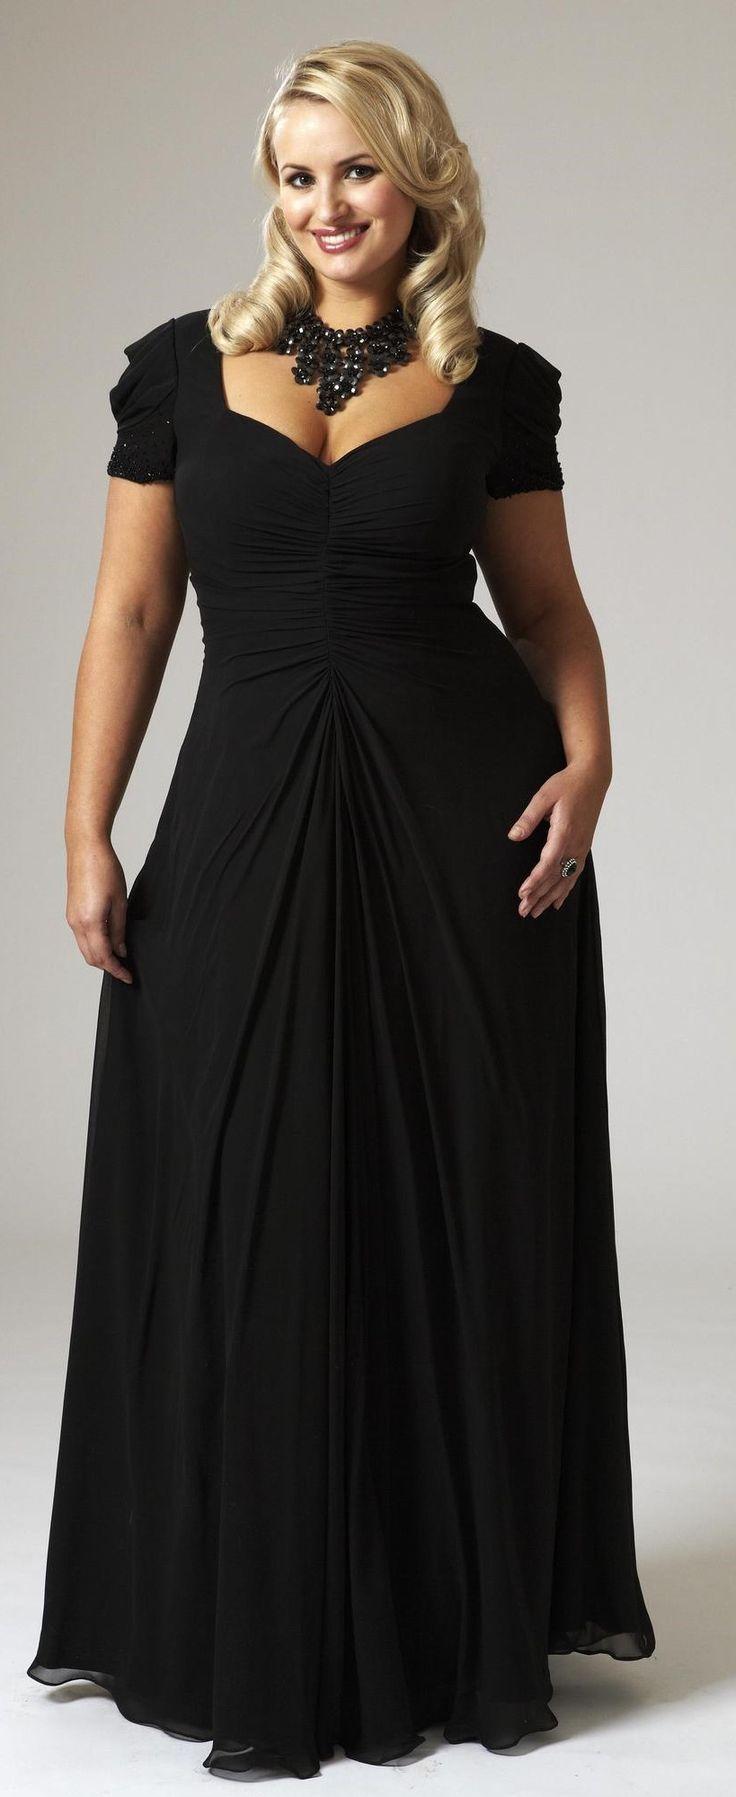 Luxury Clearance Plus Size Prom Dresses Ideas - Wedding Dress Ideas ...